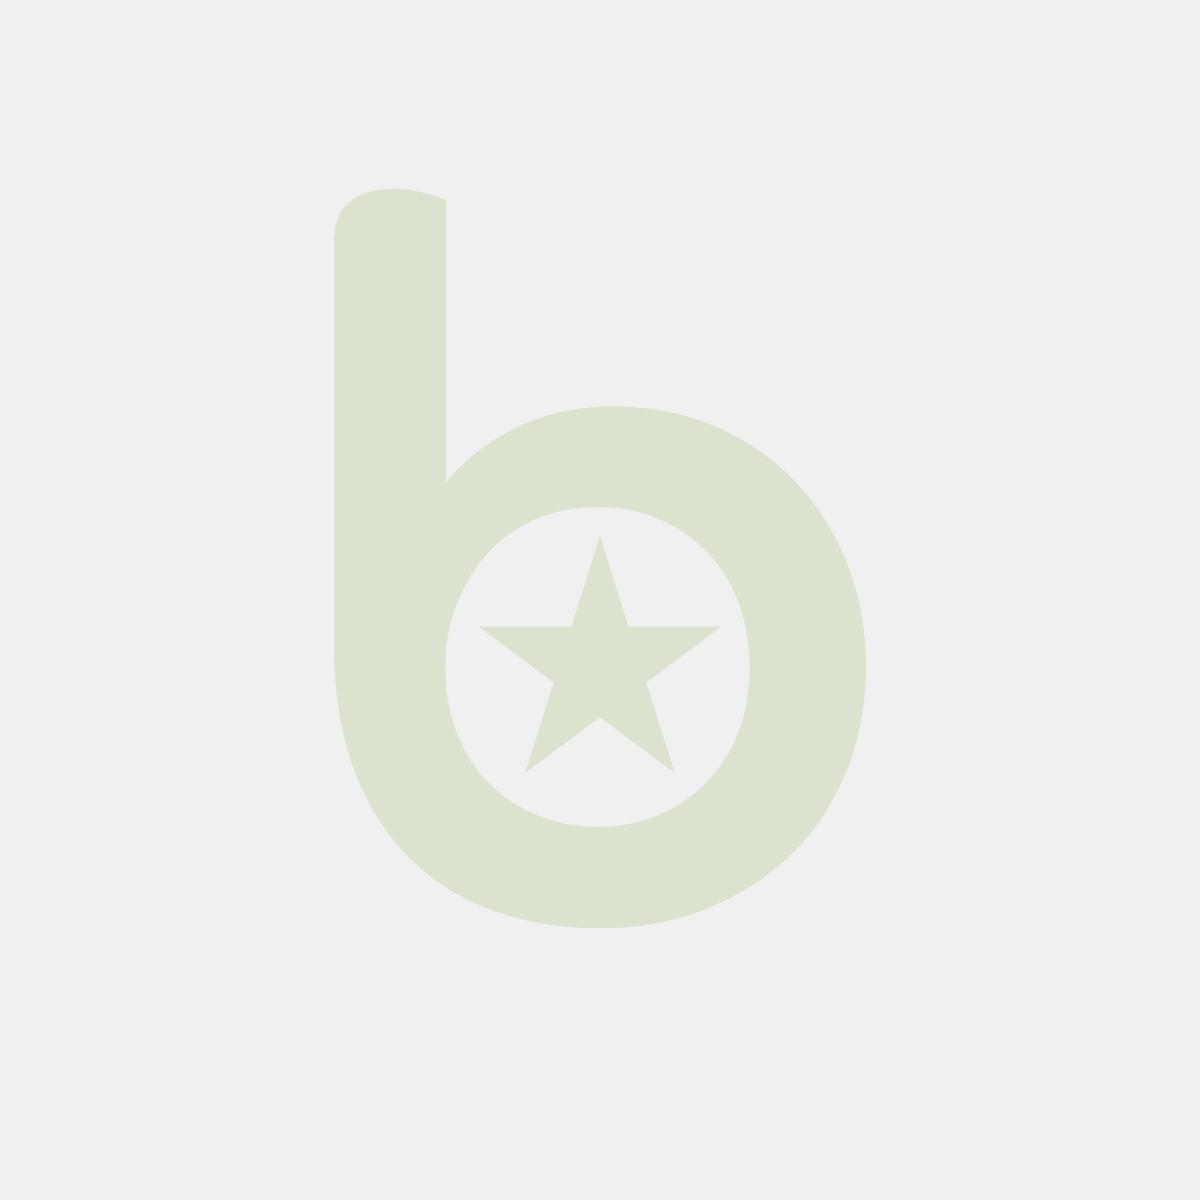 Zakaz palenia B2 - 105 x 105mm RA502B2FN